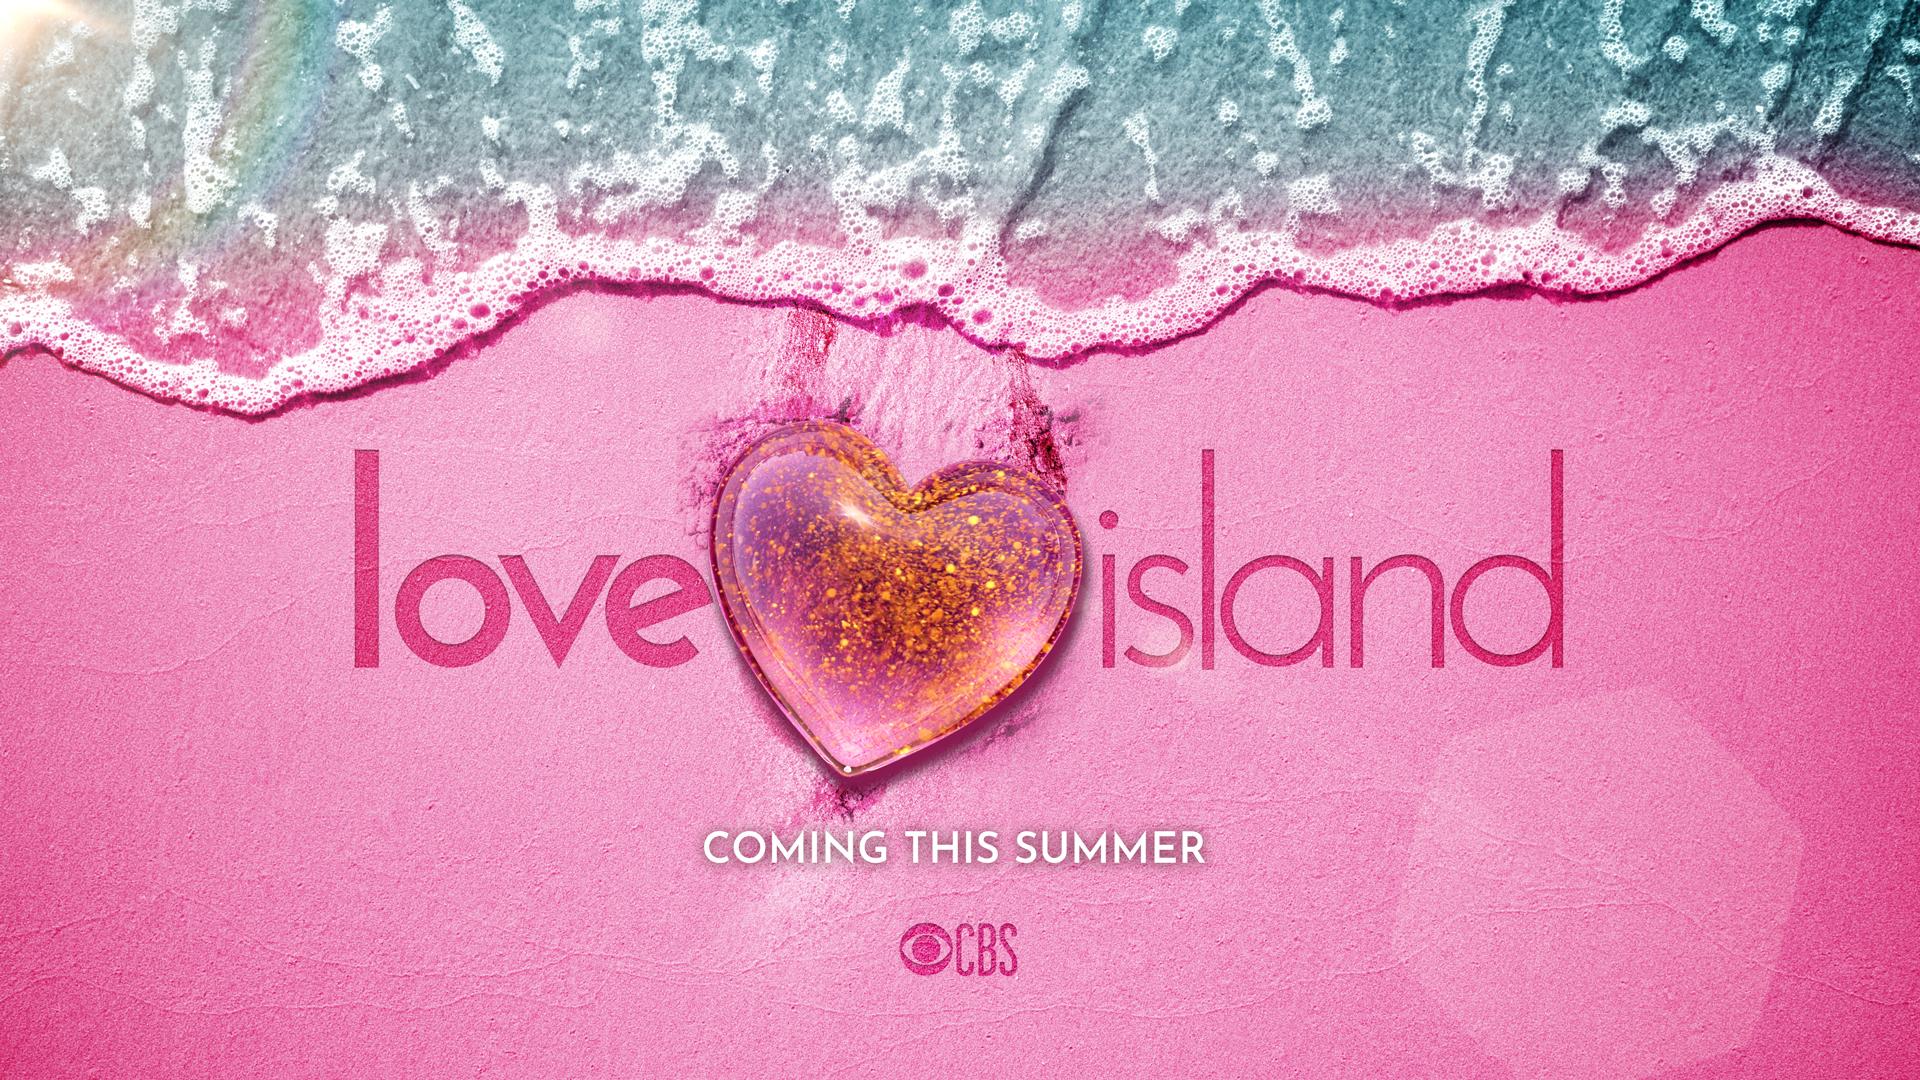 71cf6082ca24a7e2_love-island-cbs-logo-coming-soon-promo.jpg